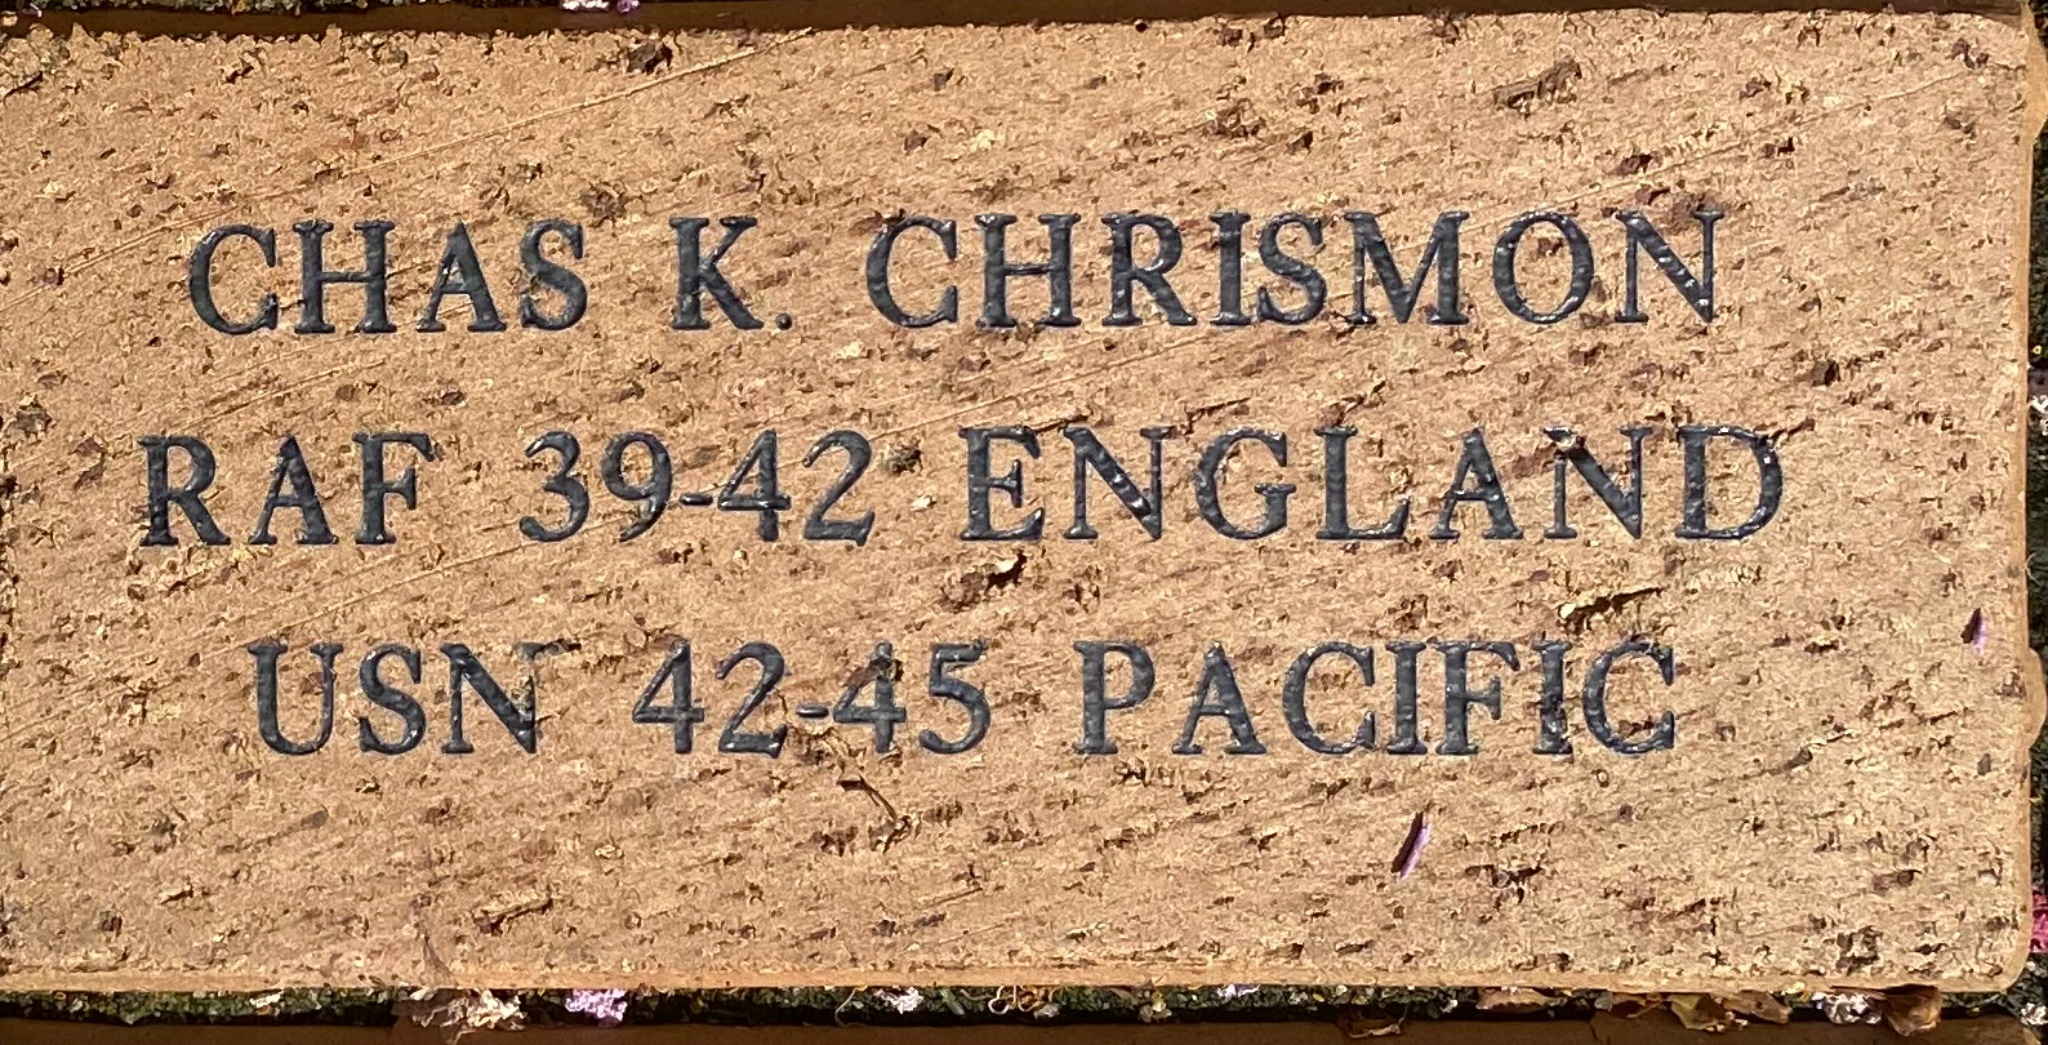 CHAS K. CHRISMON RAF 39-42 ENGLAND USN 42-45 PACIFIC